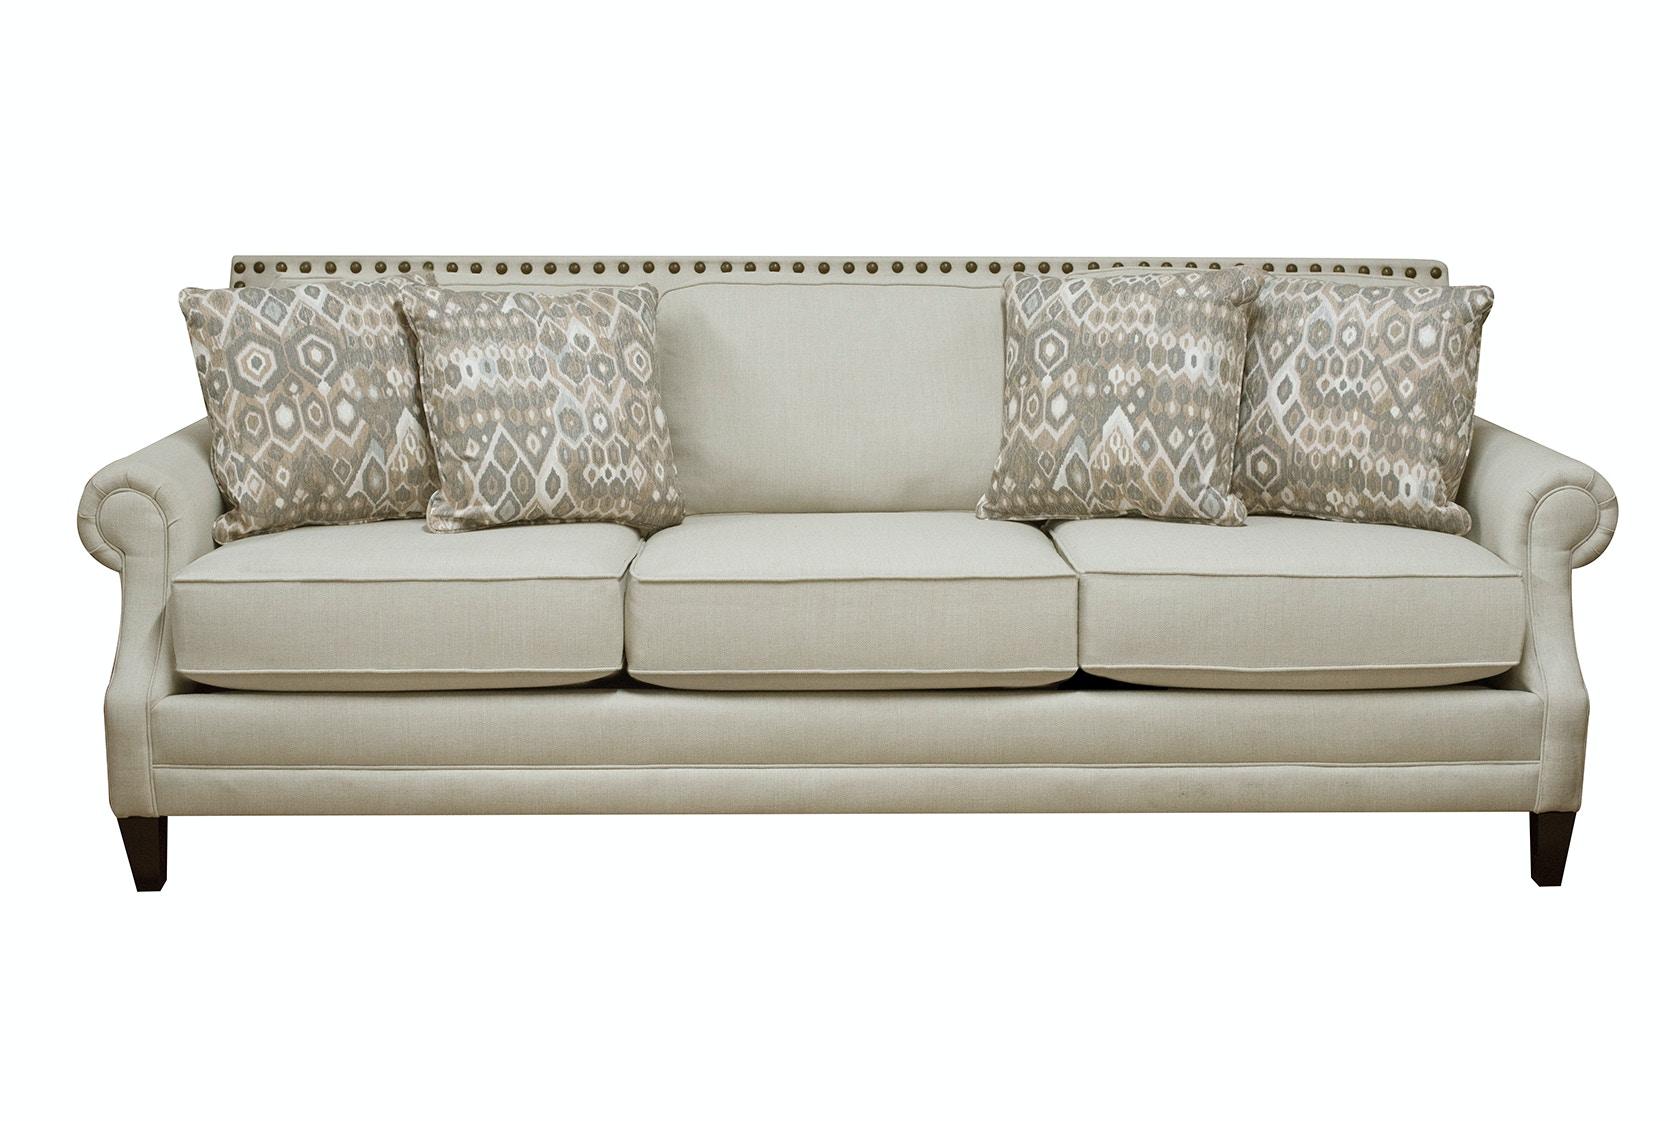 palmer sofa bed mattress argos living room st 511047